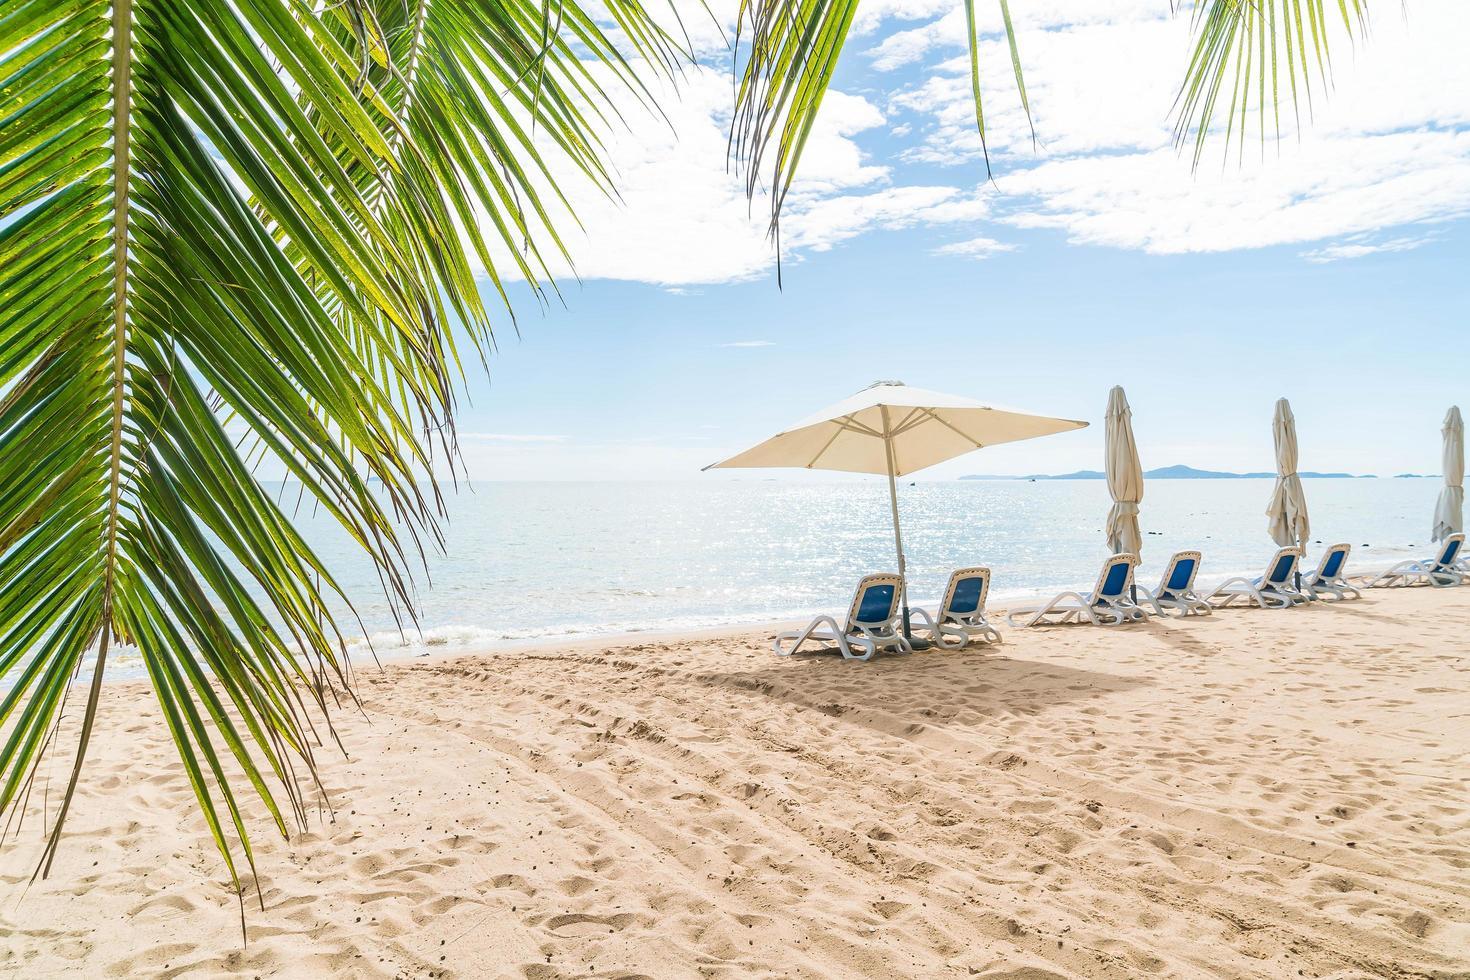 Tropical beach scene with open umbrella photo